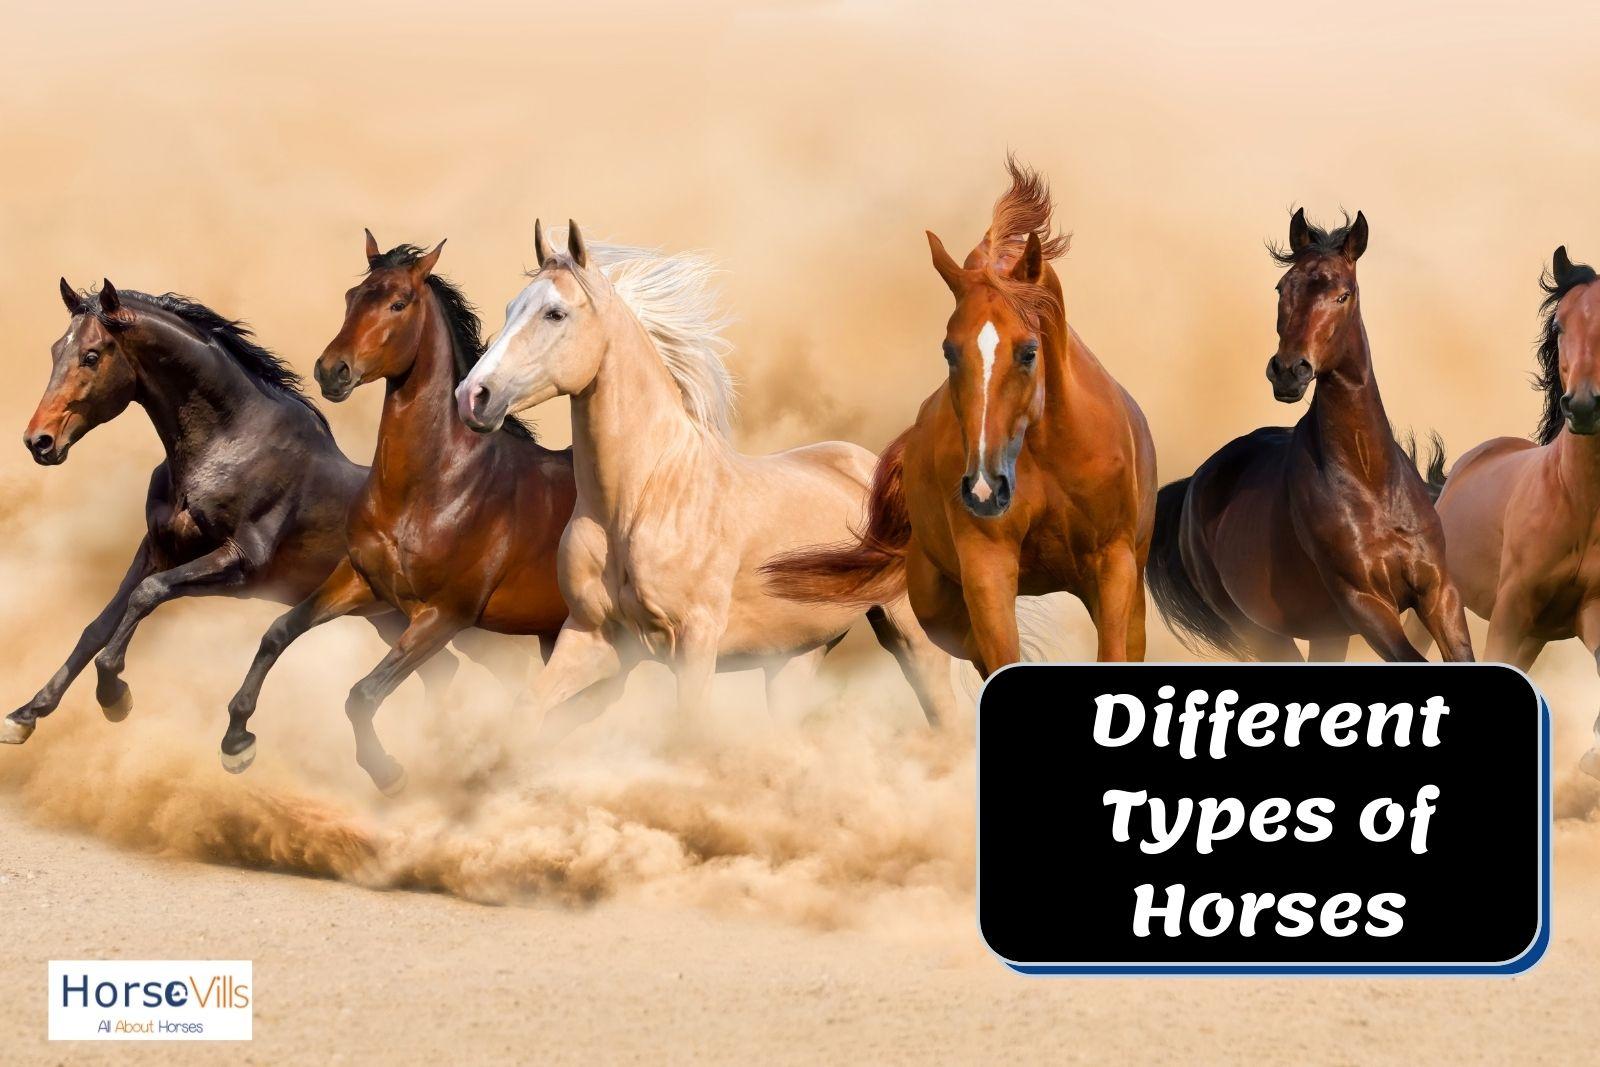 different types of horses running in the desert